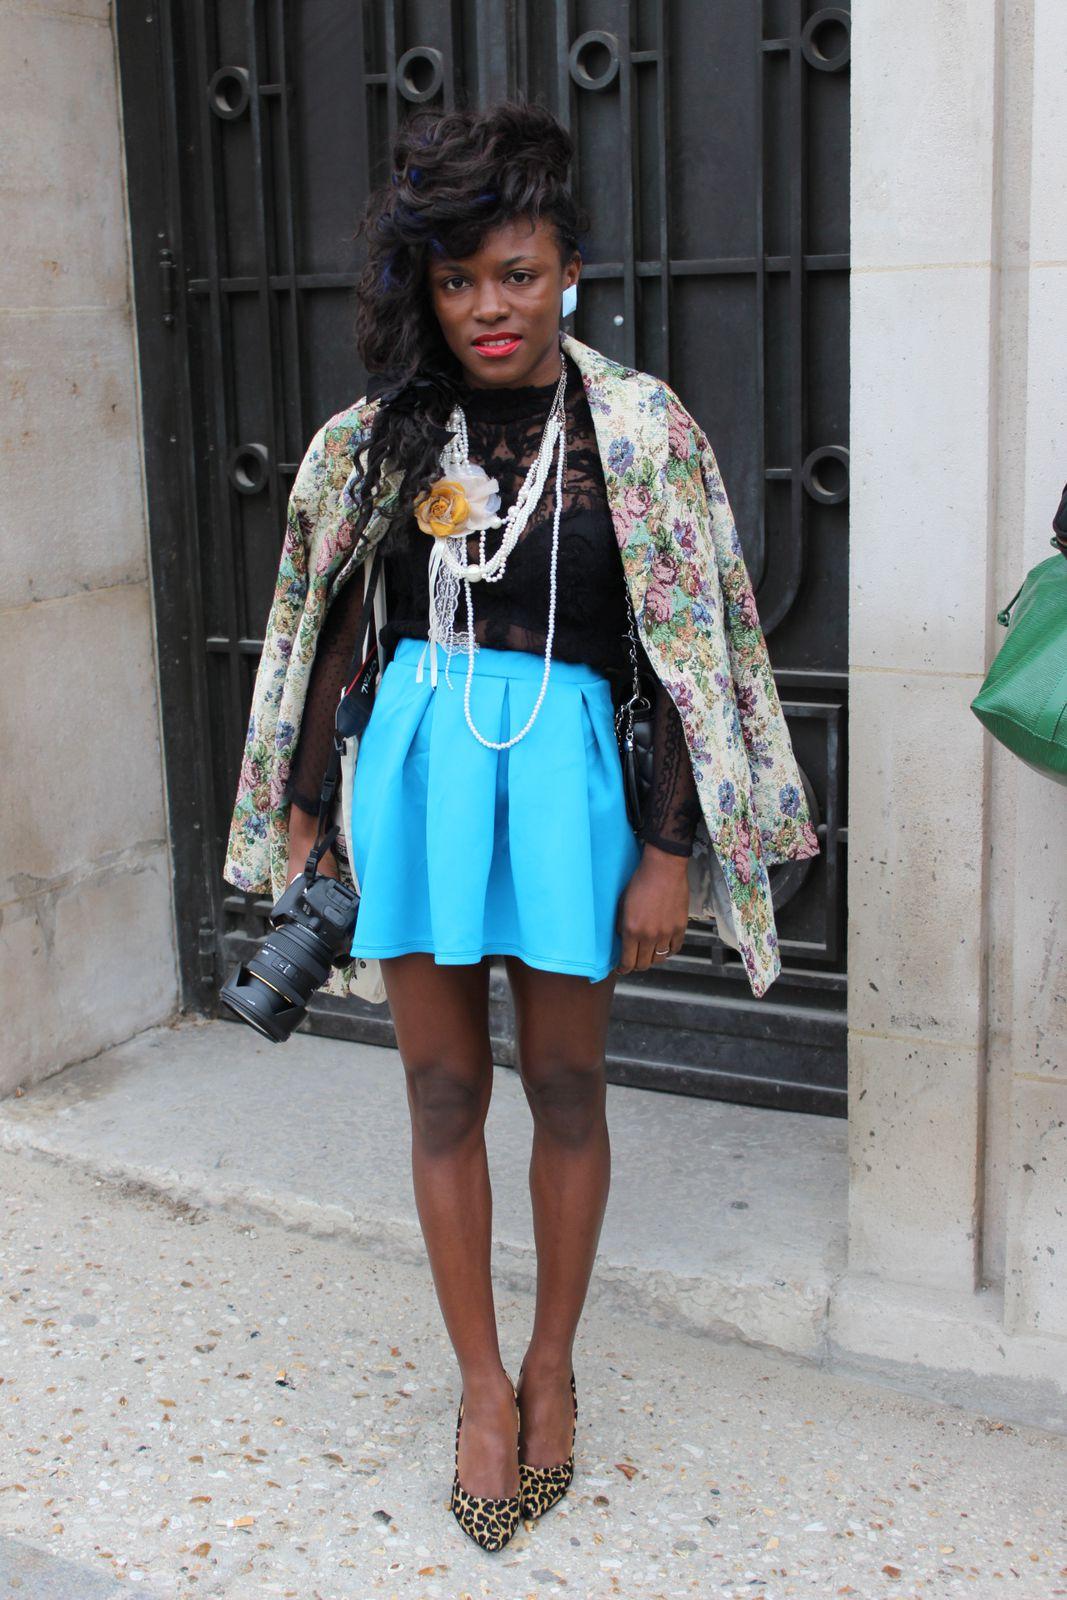 Fashion week 2013 #girlsincolor